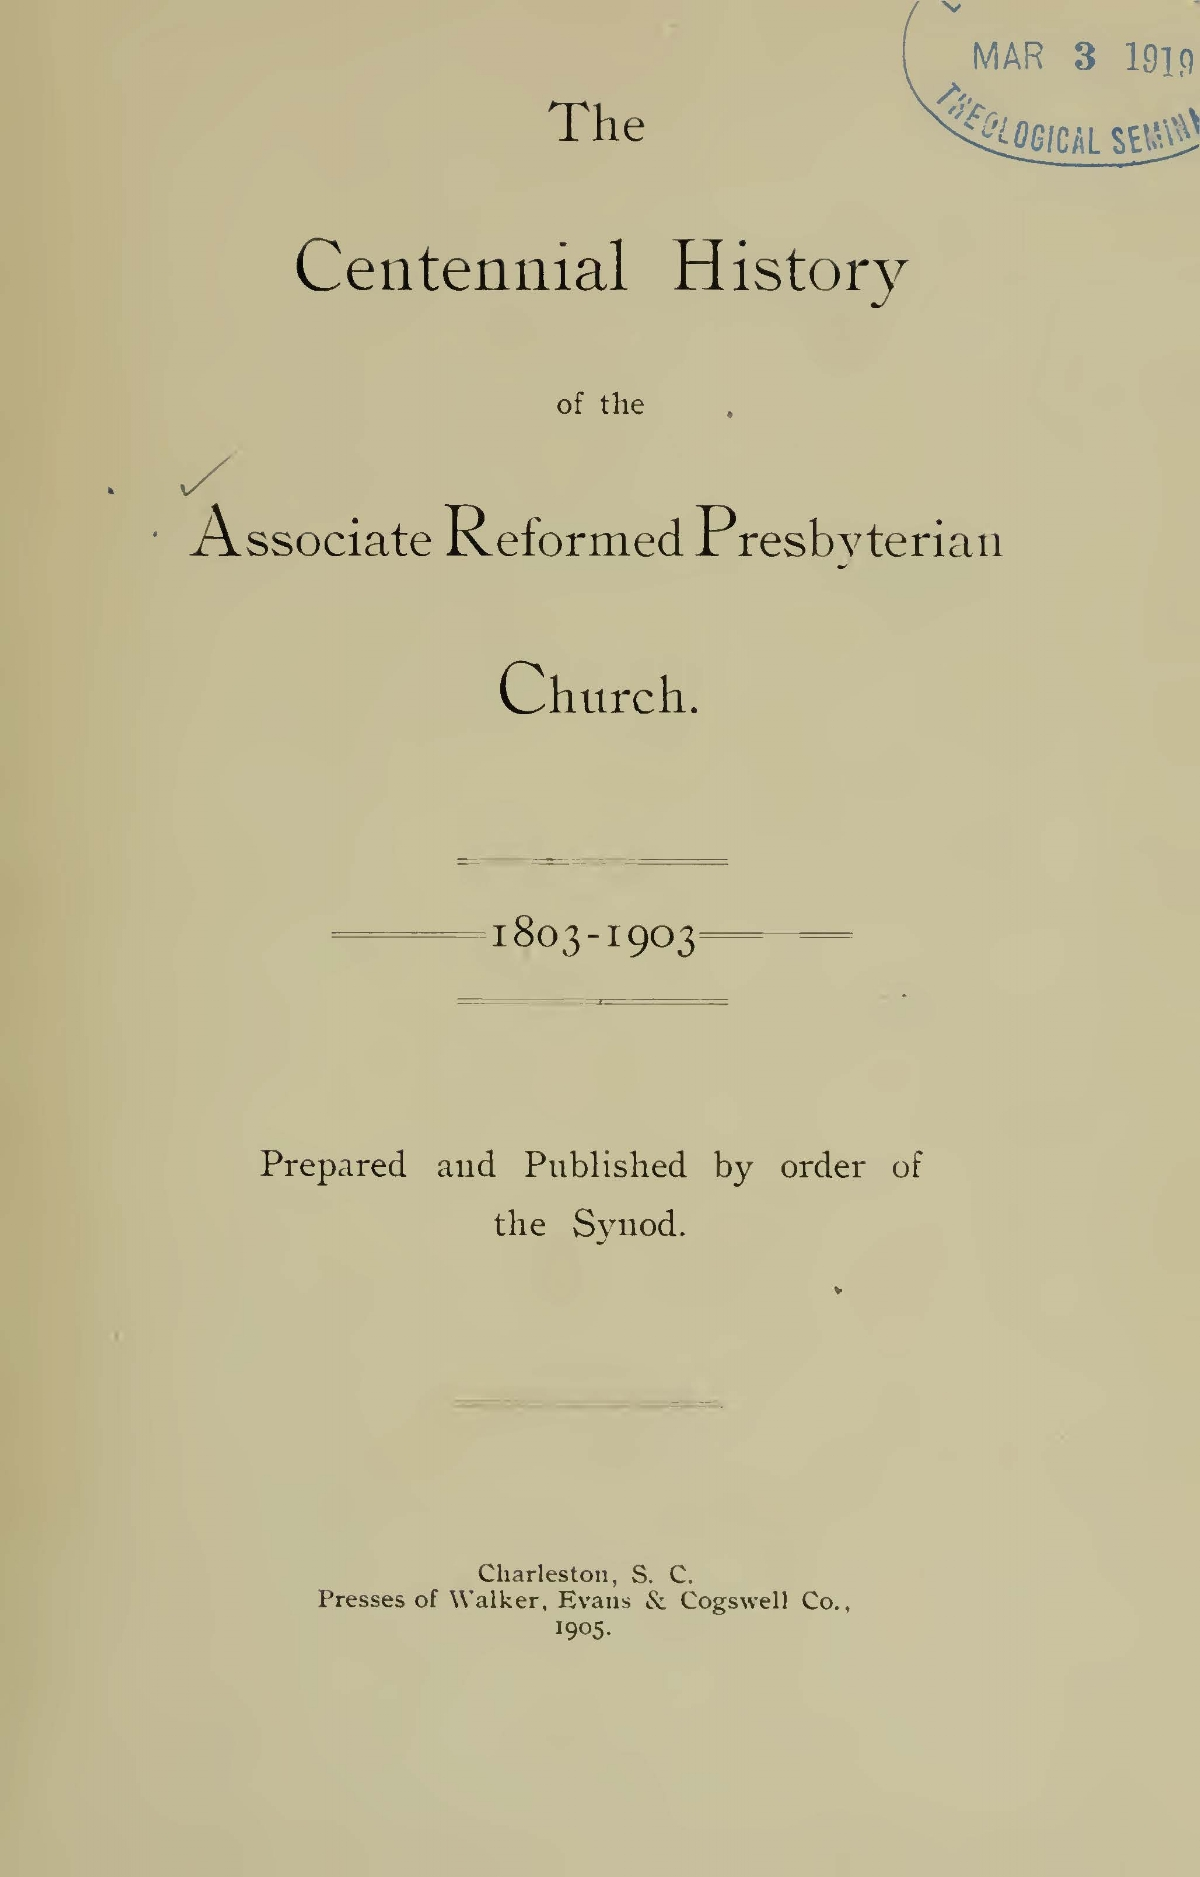 Galloway, Jonathan Caldwell, The Centennial History of the Associate Reformed Presbyterian Church Title Page.jpg